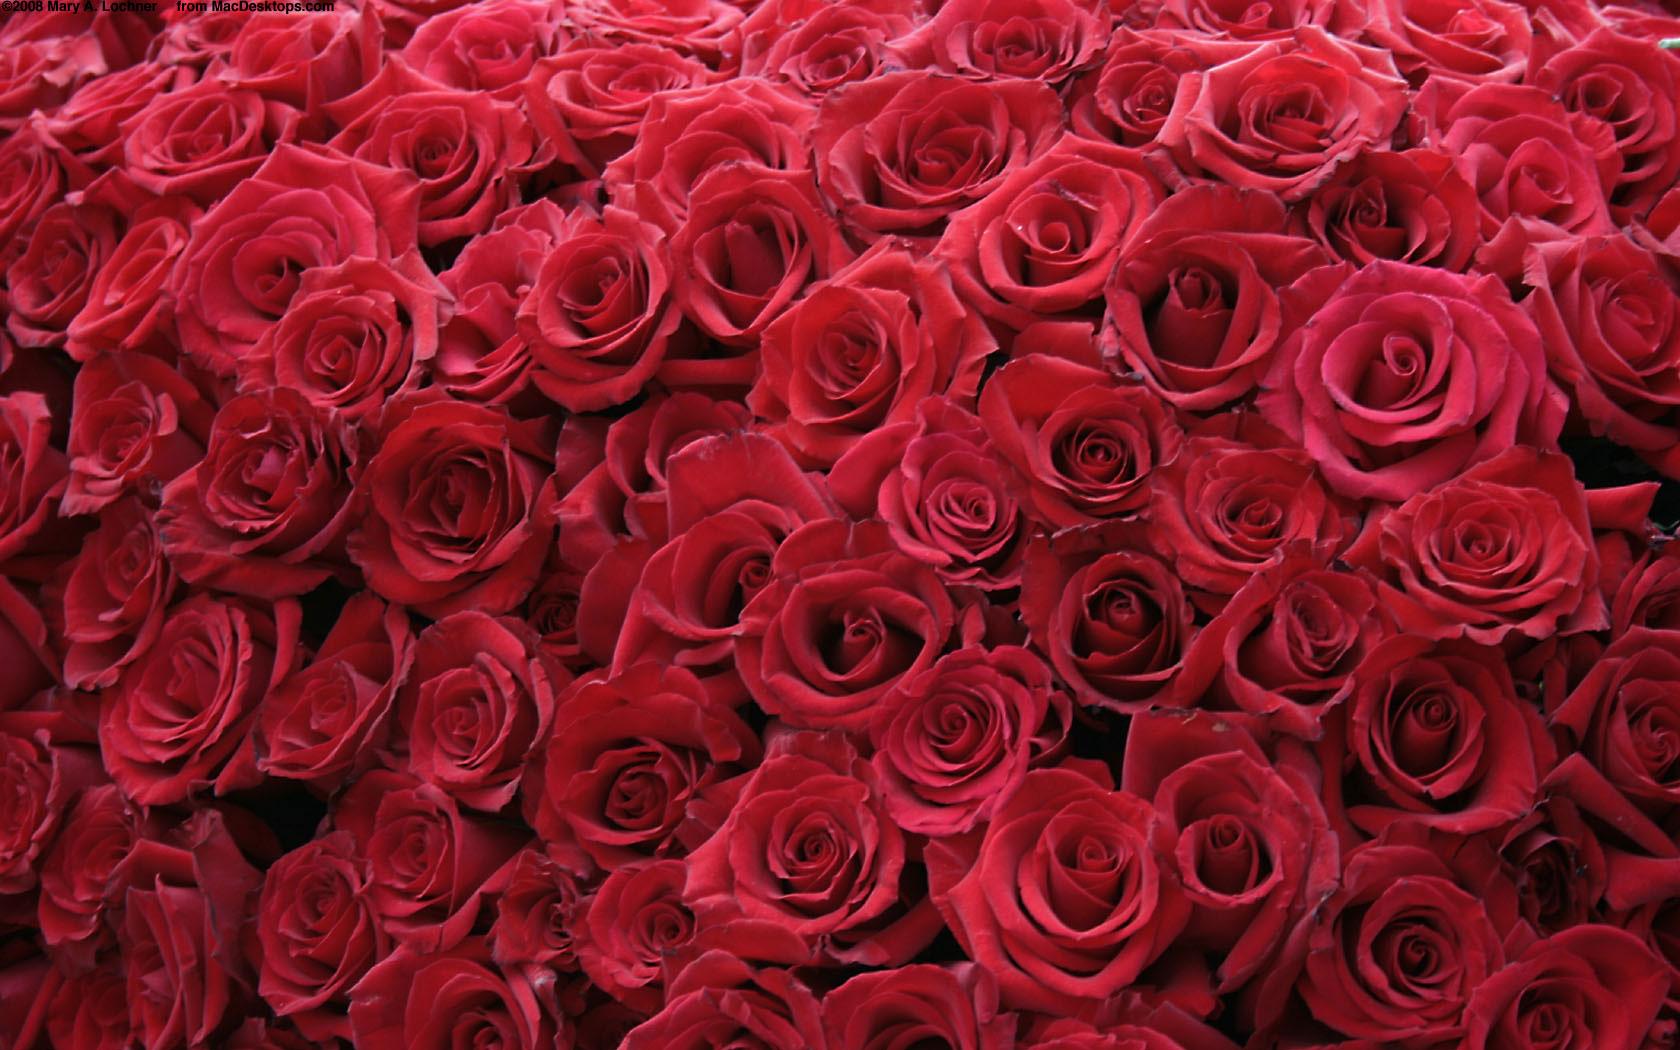 Red Roses Wallpaper HD Wallpaper Flowers Wallpapers 1680x1050